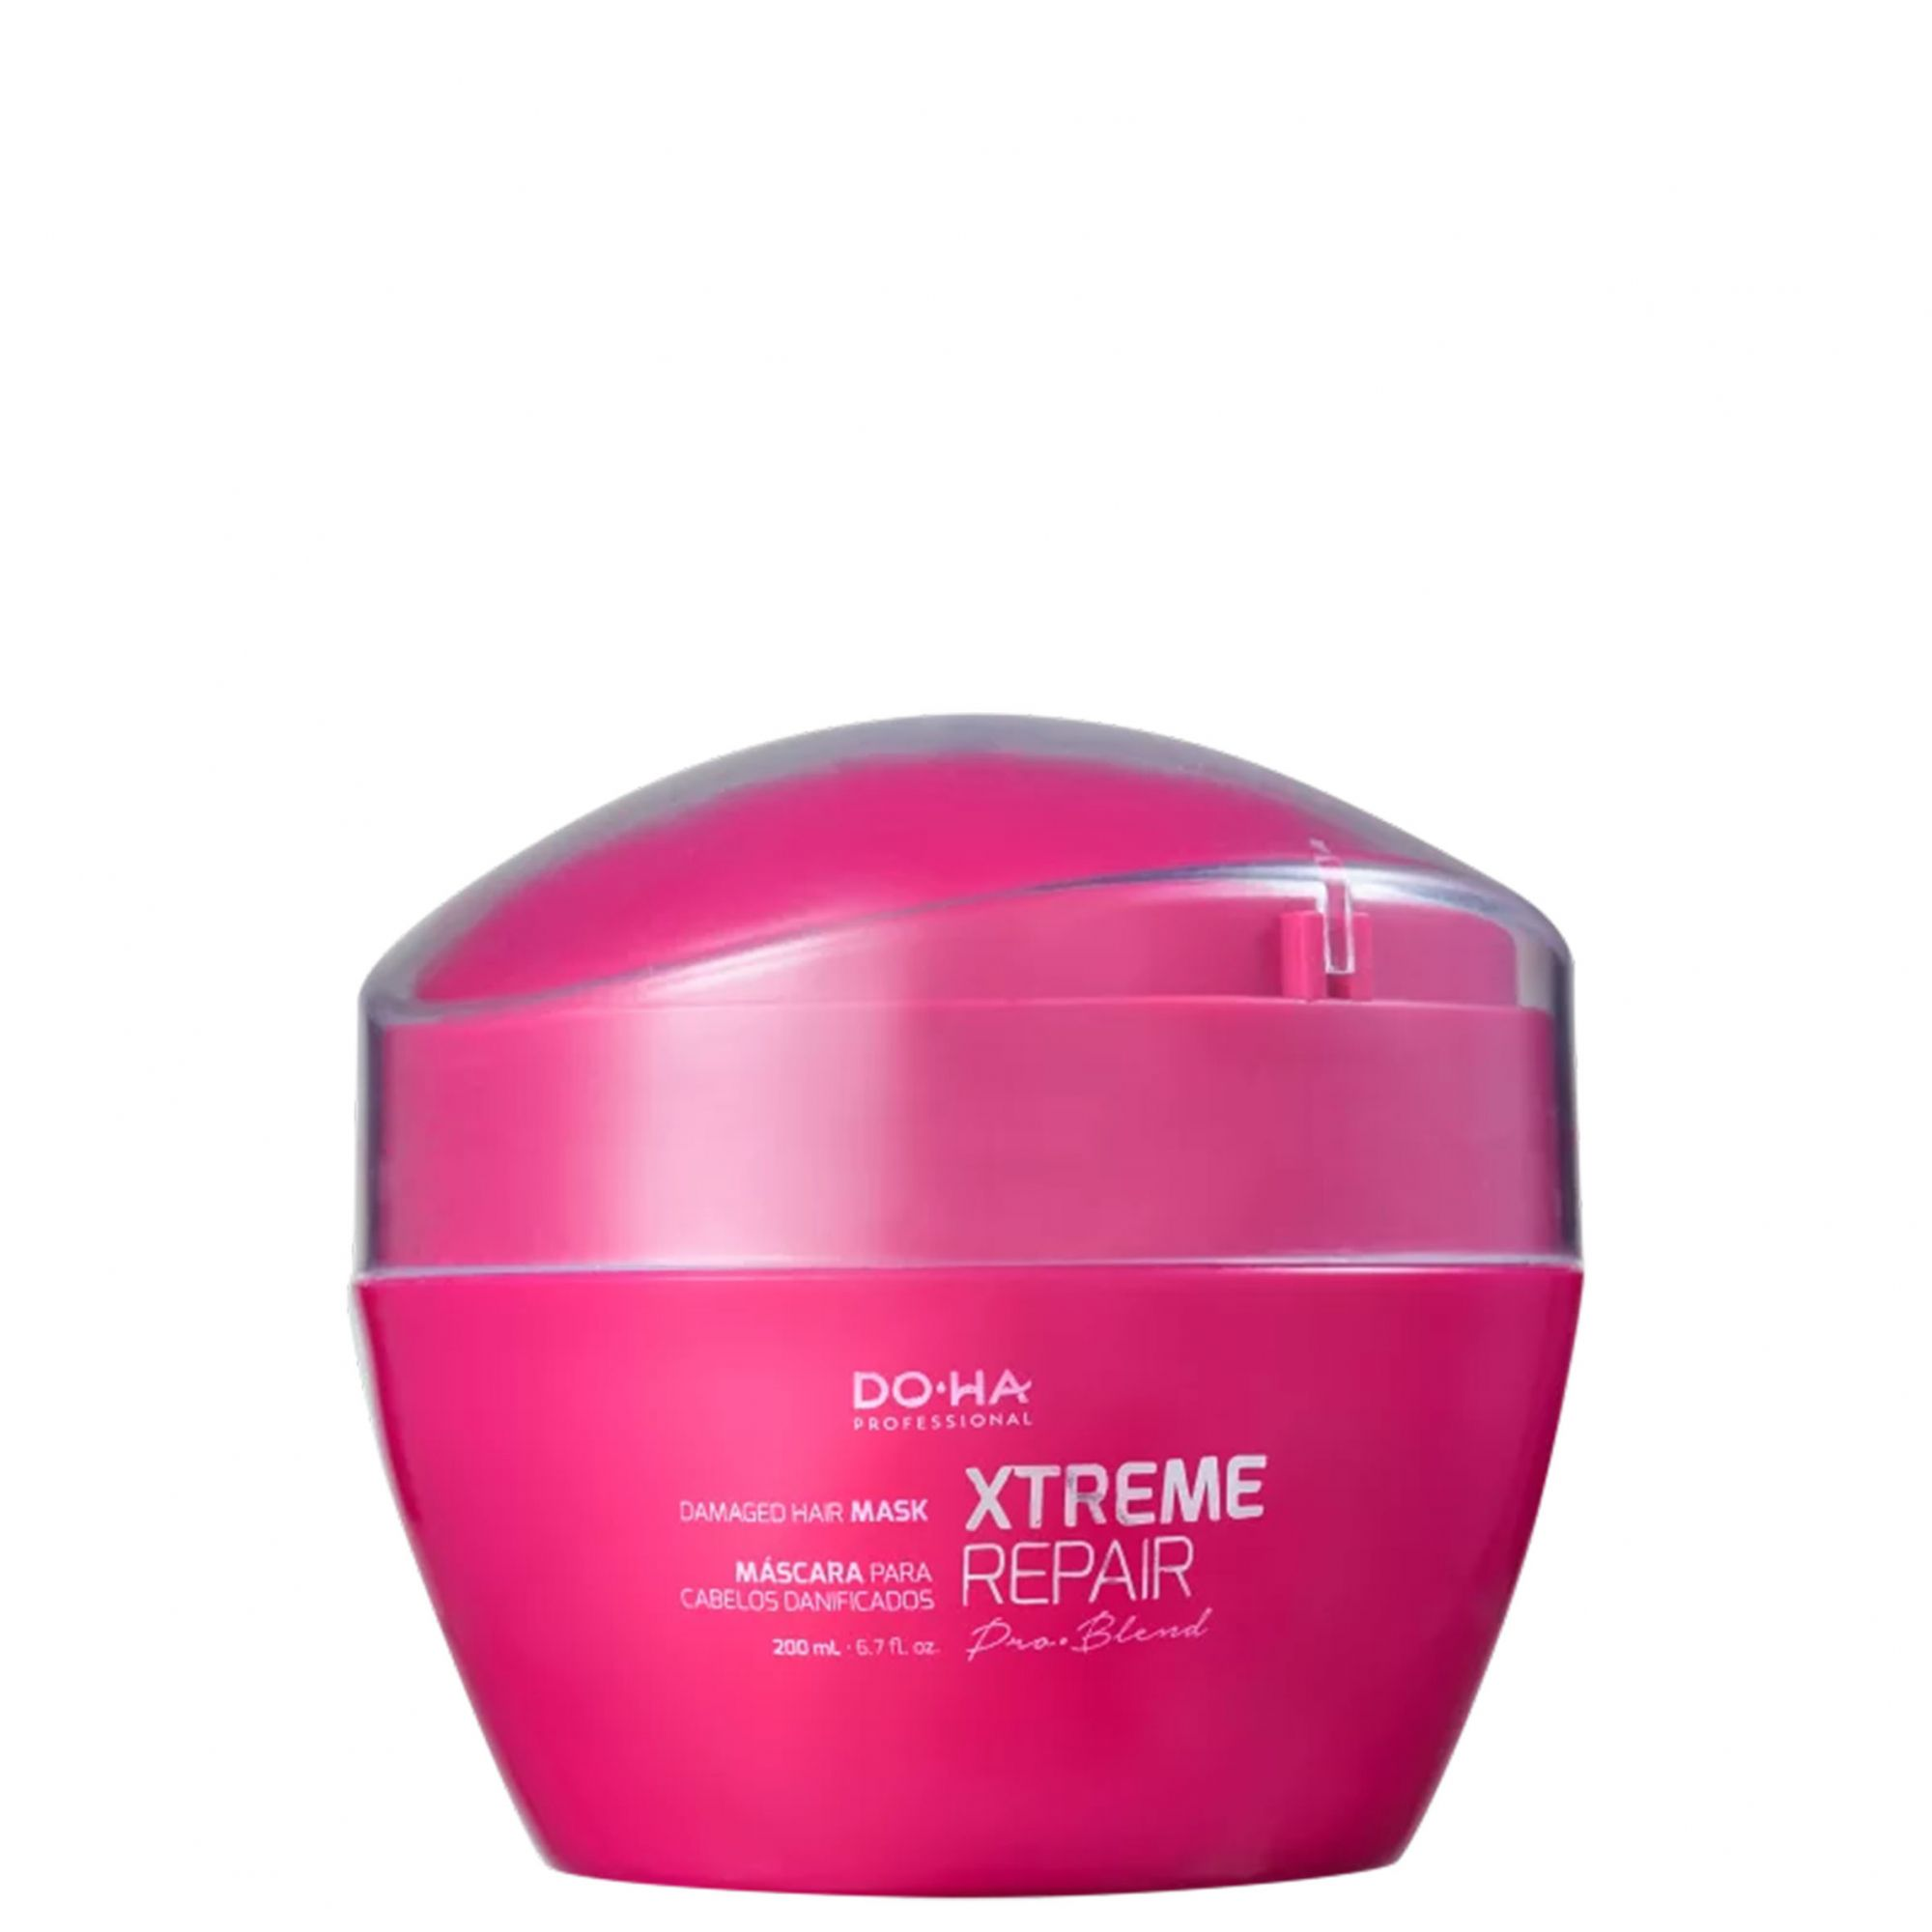 DO.HA Xtreme Repair Máscara Capilar 200ml